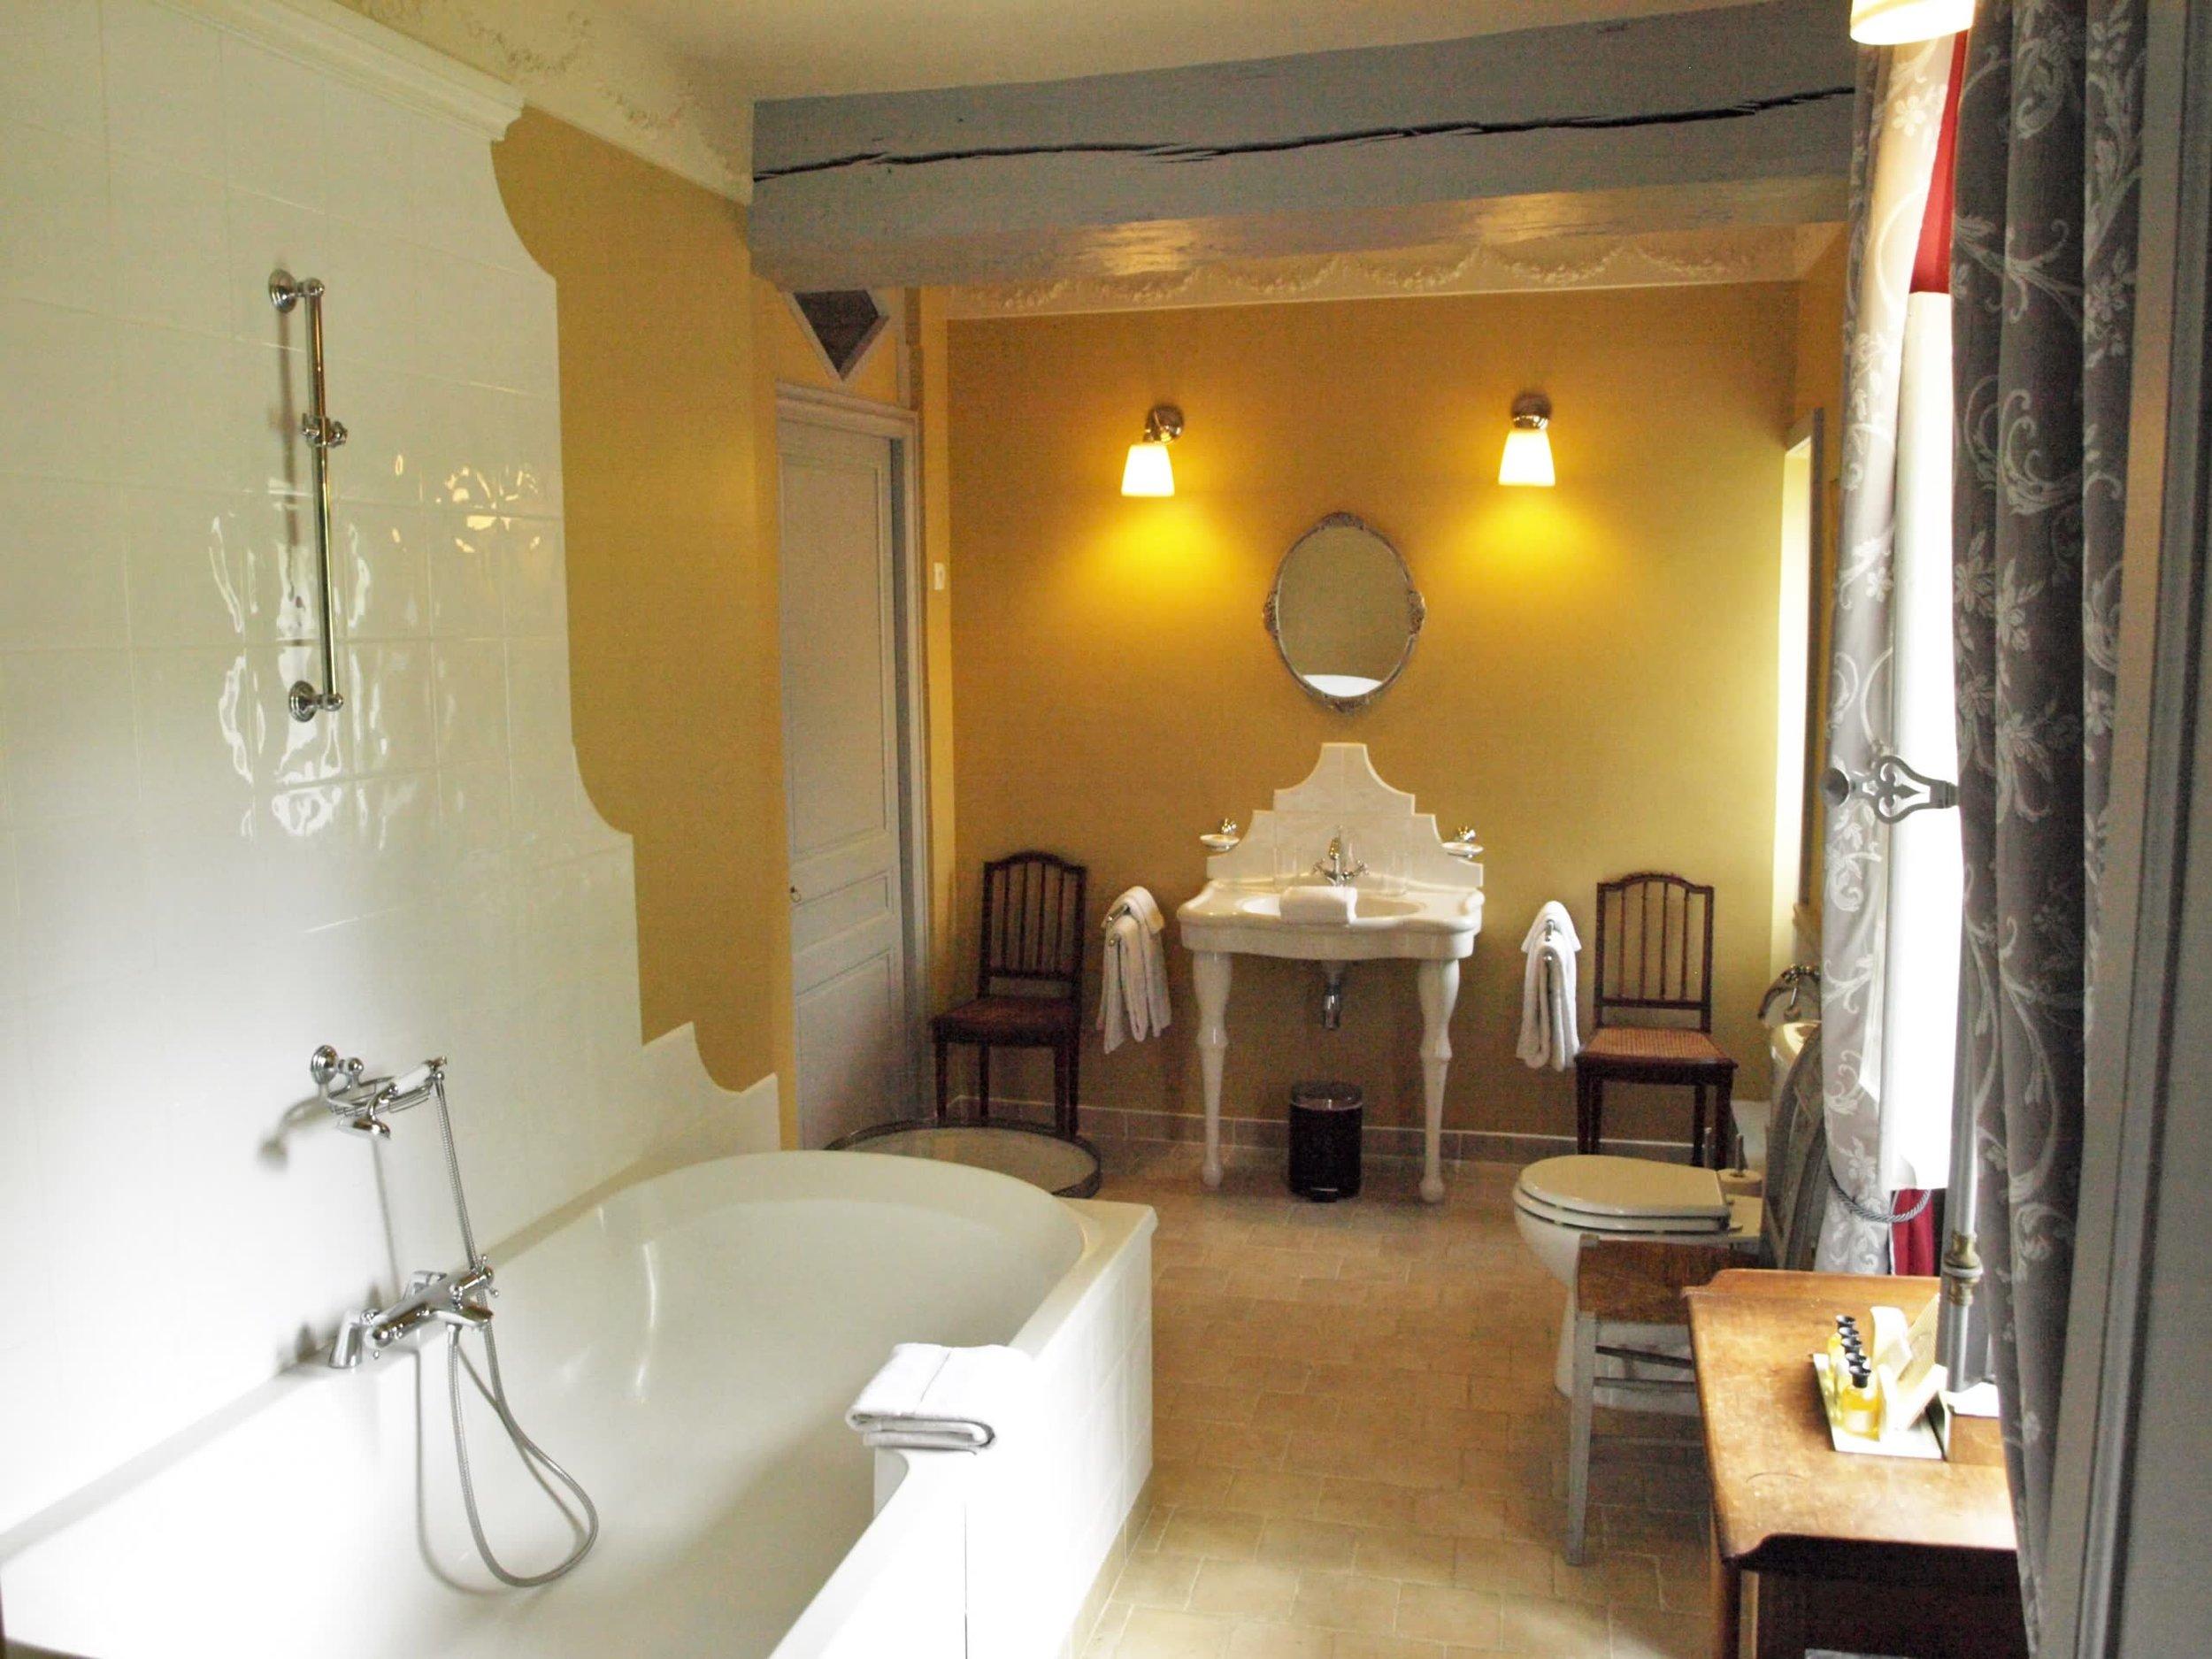 Chateau de la Pommeraye - charming boutique hotel chateau b&b spa normandy calvados bedroom Levants 4(2).jpg